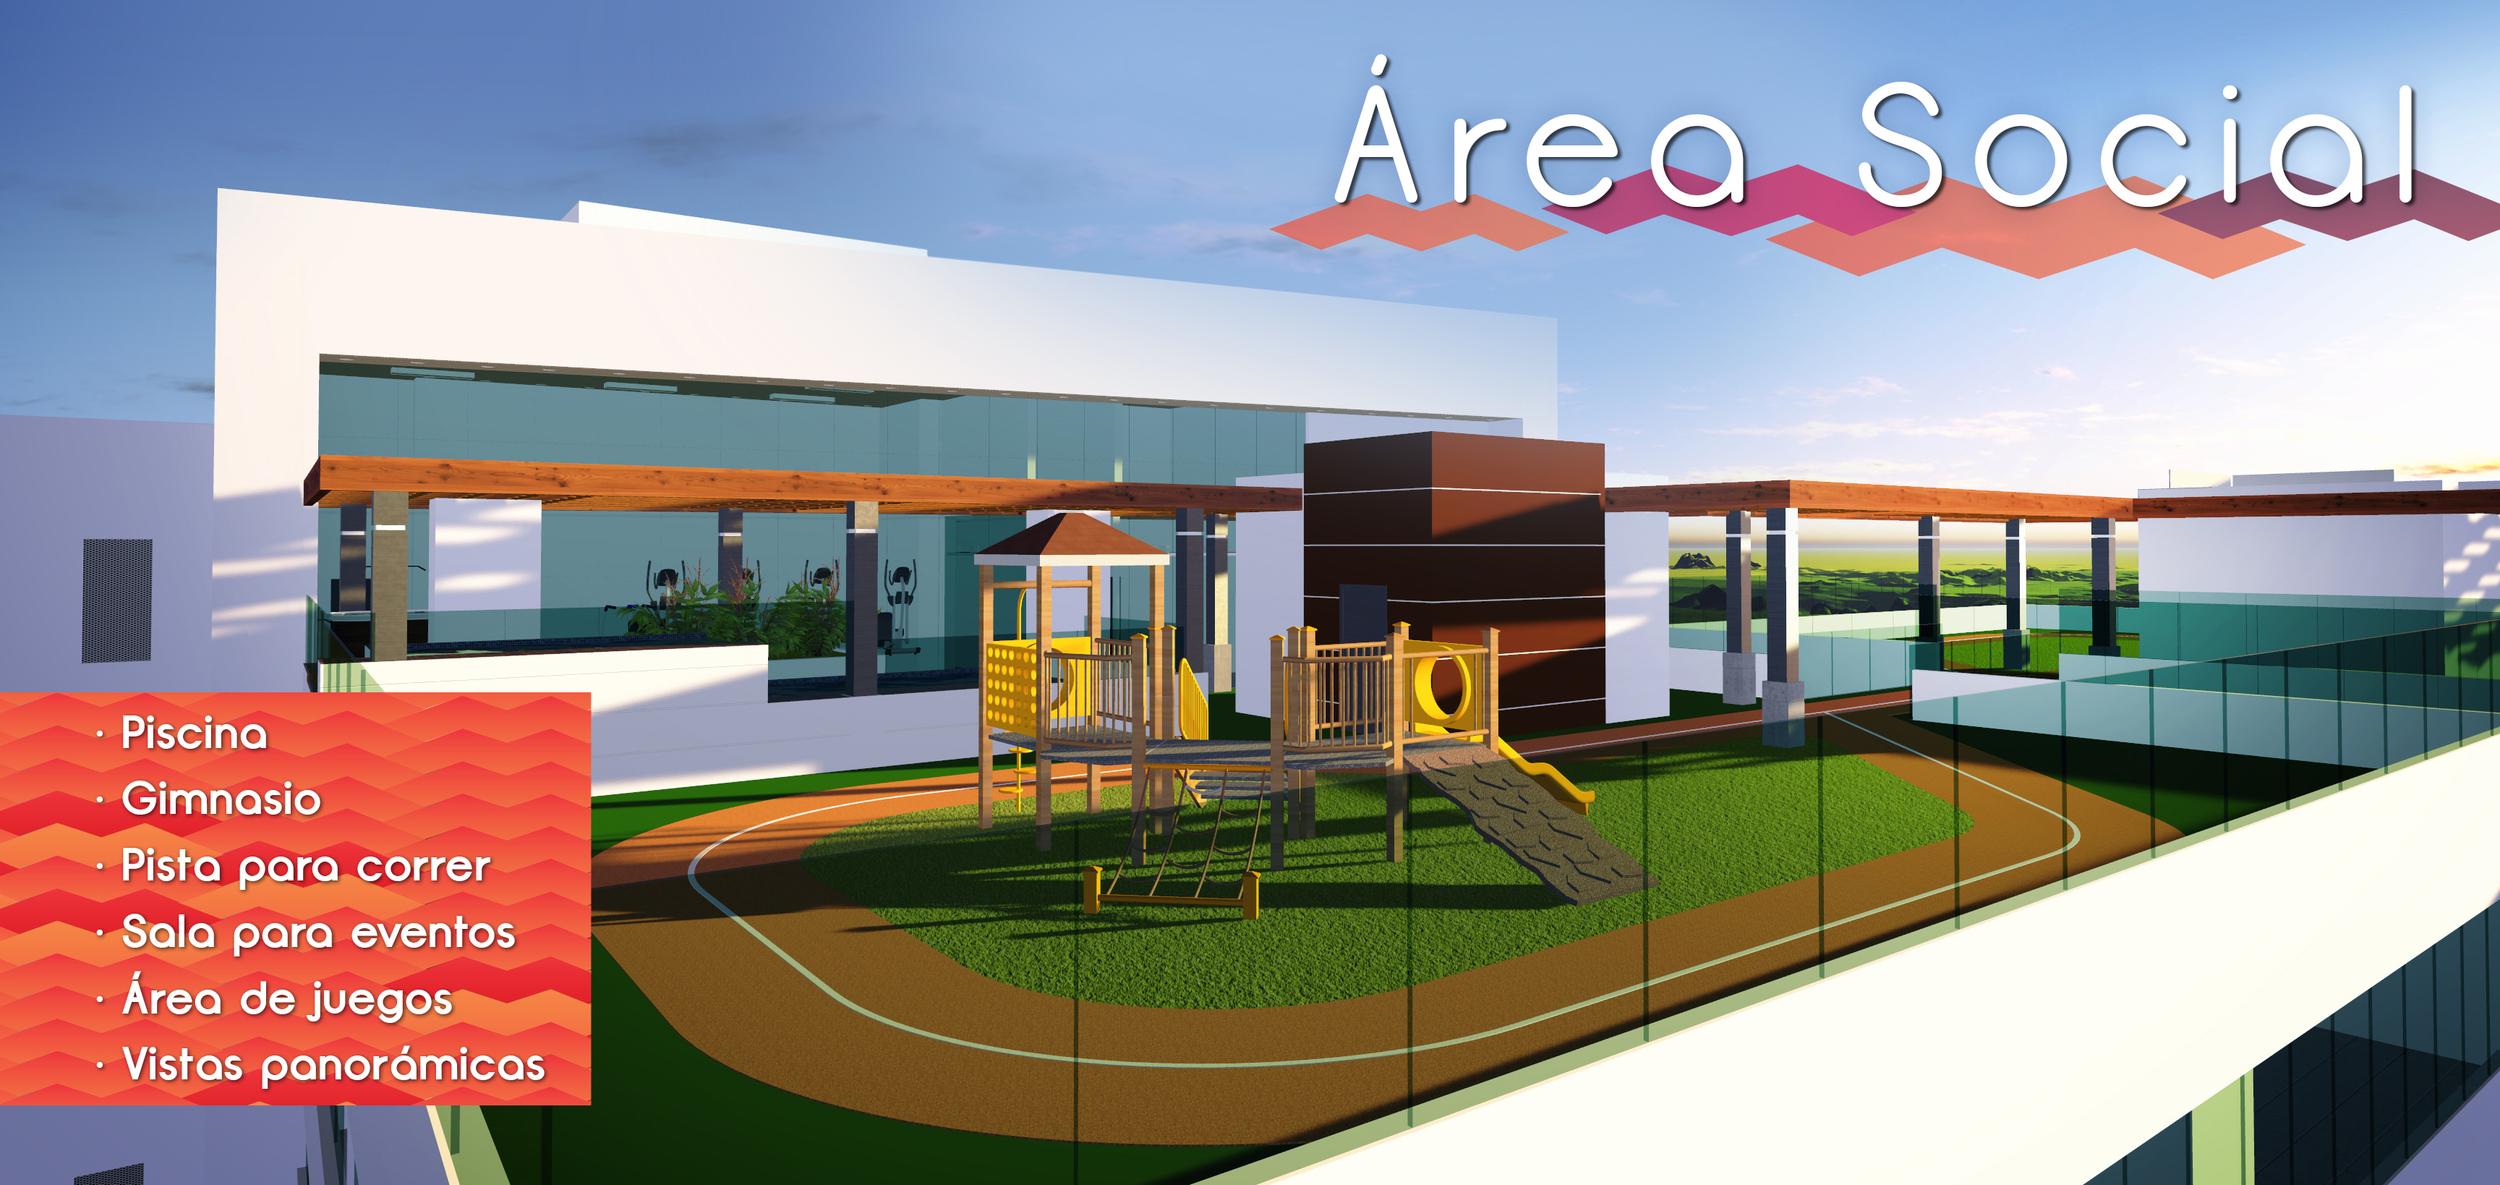 AreaSocial-Portada2.jpg